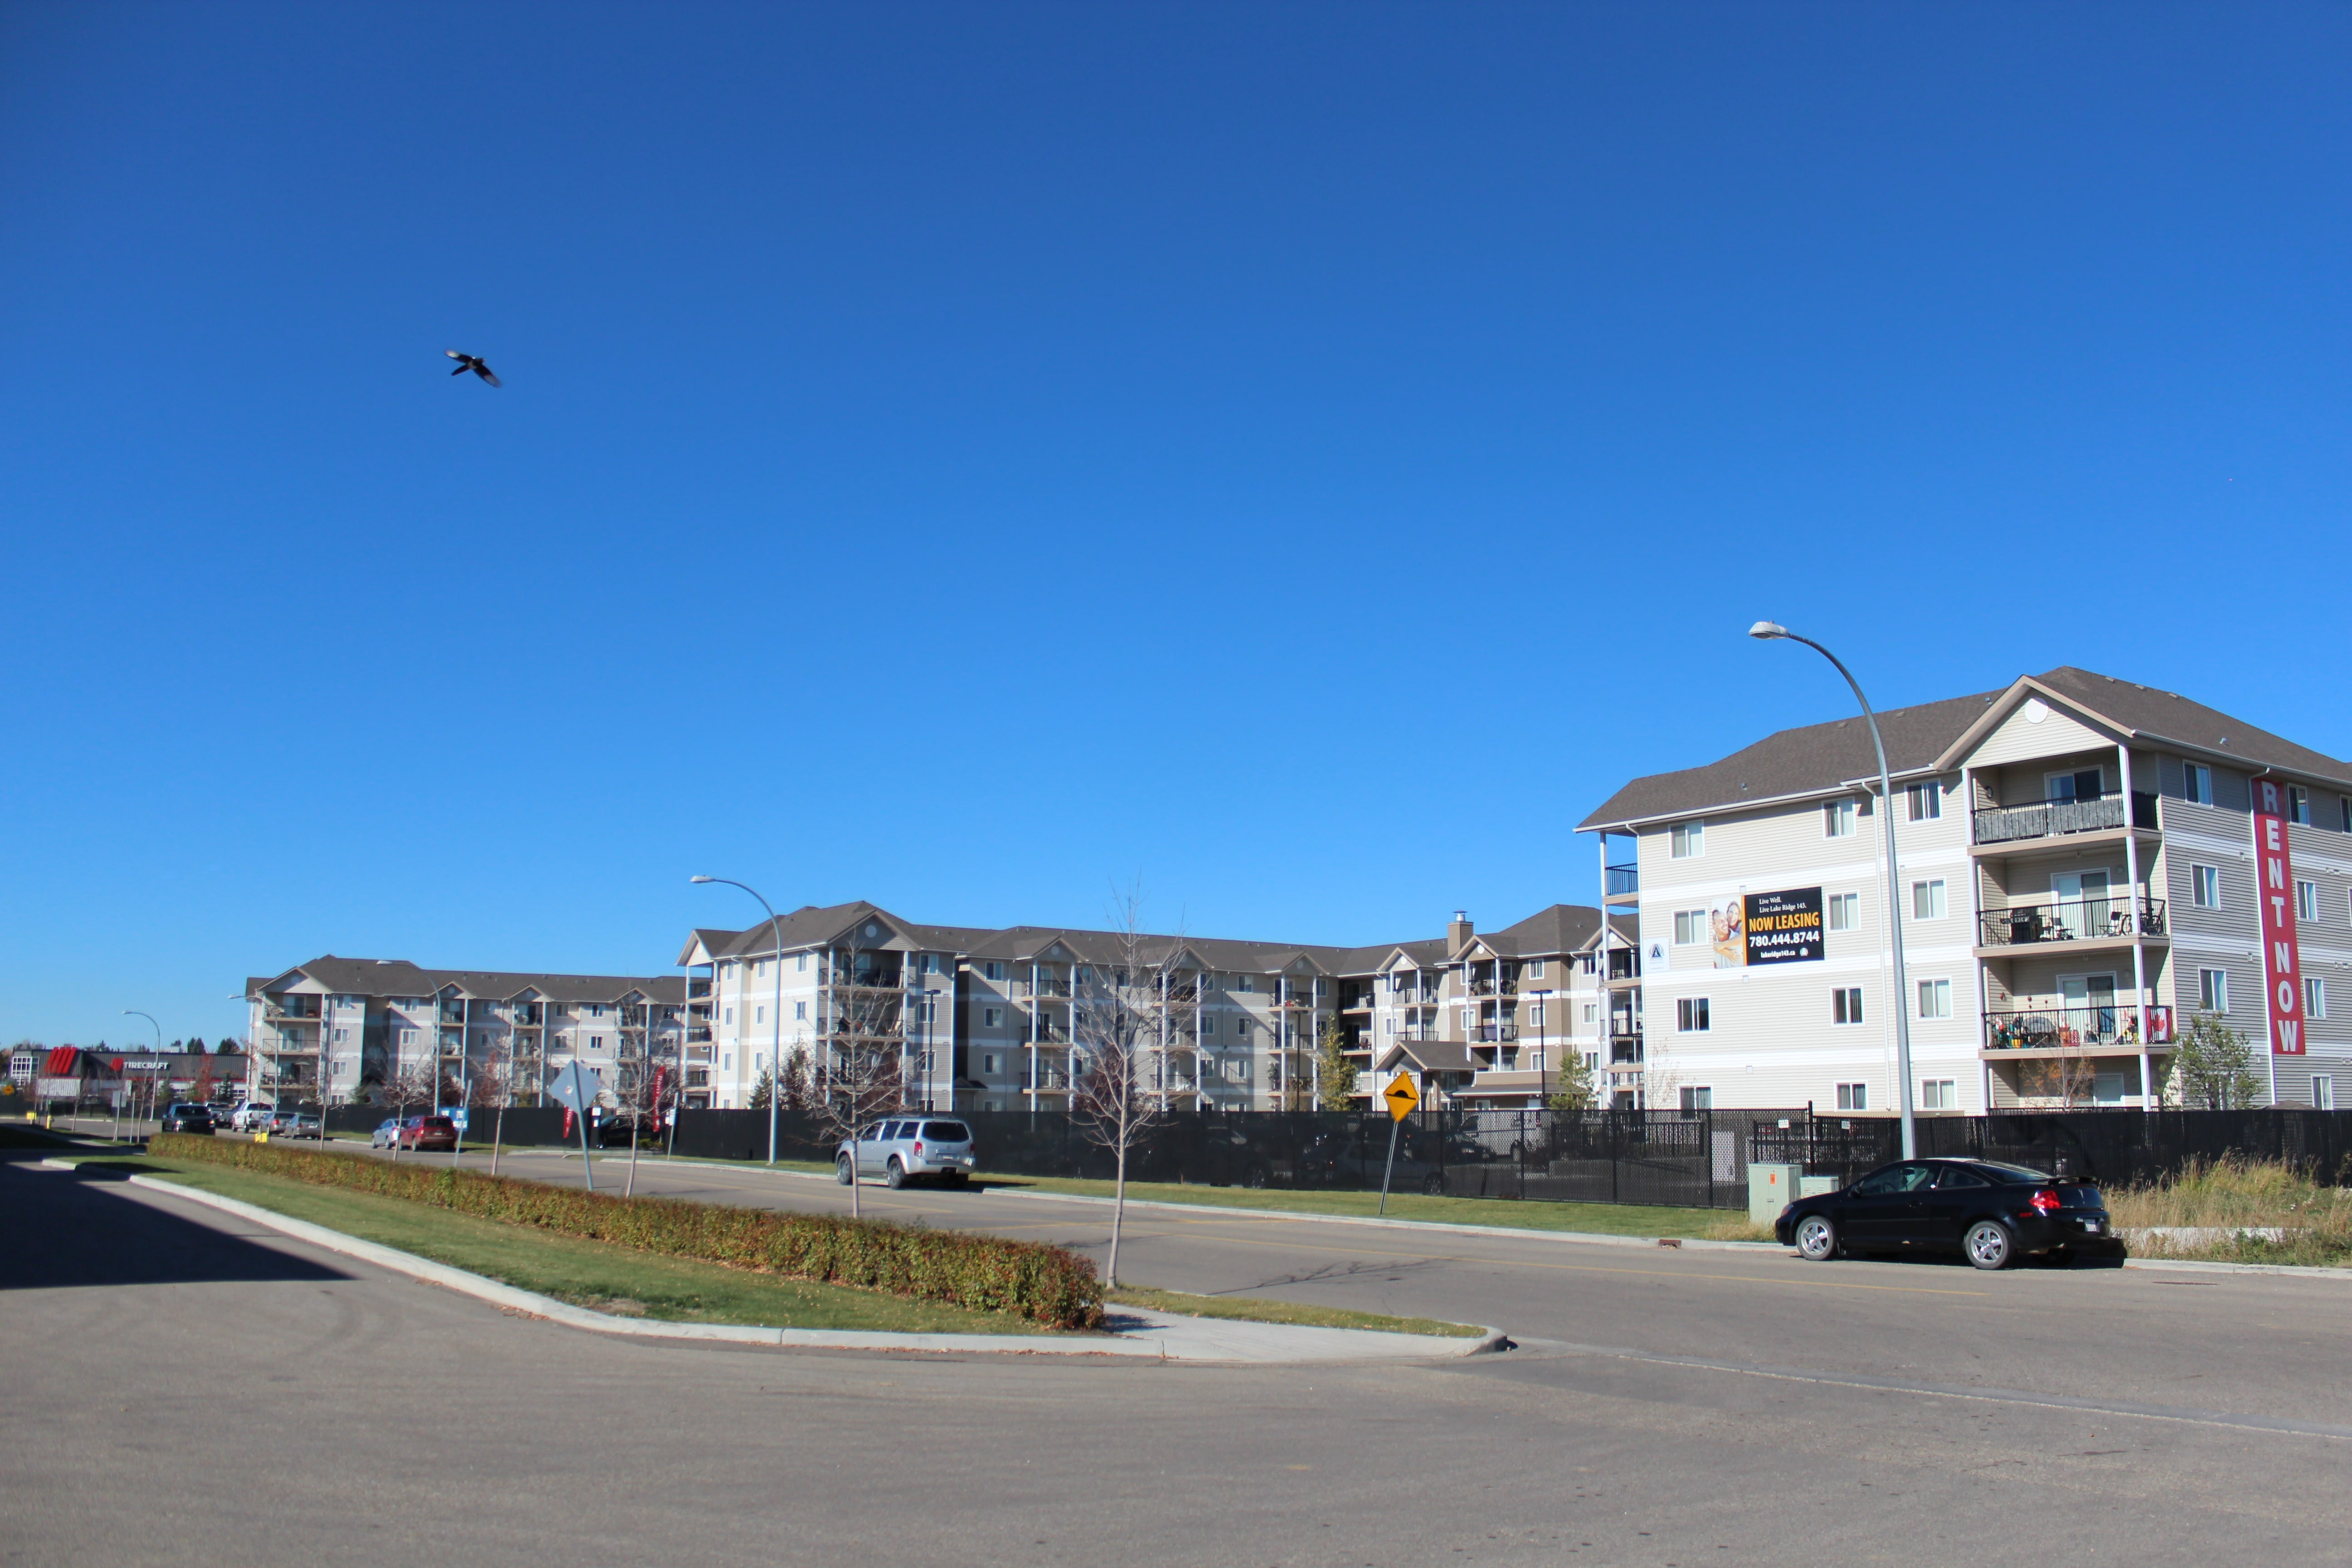 Lakeridge Condominiums (242 units) Completed October 2014